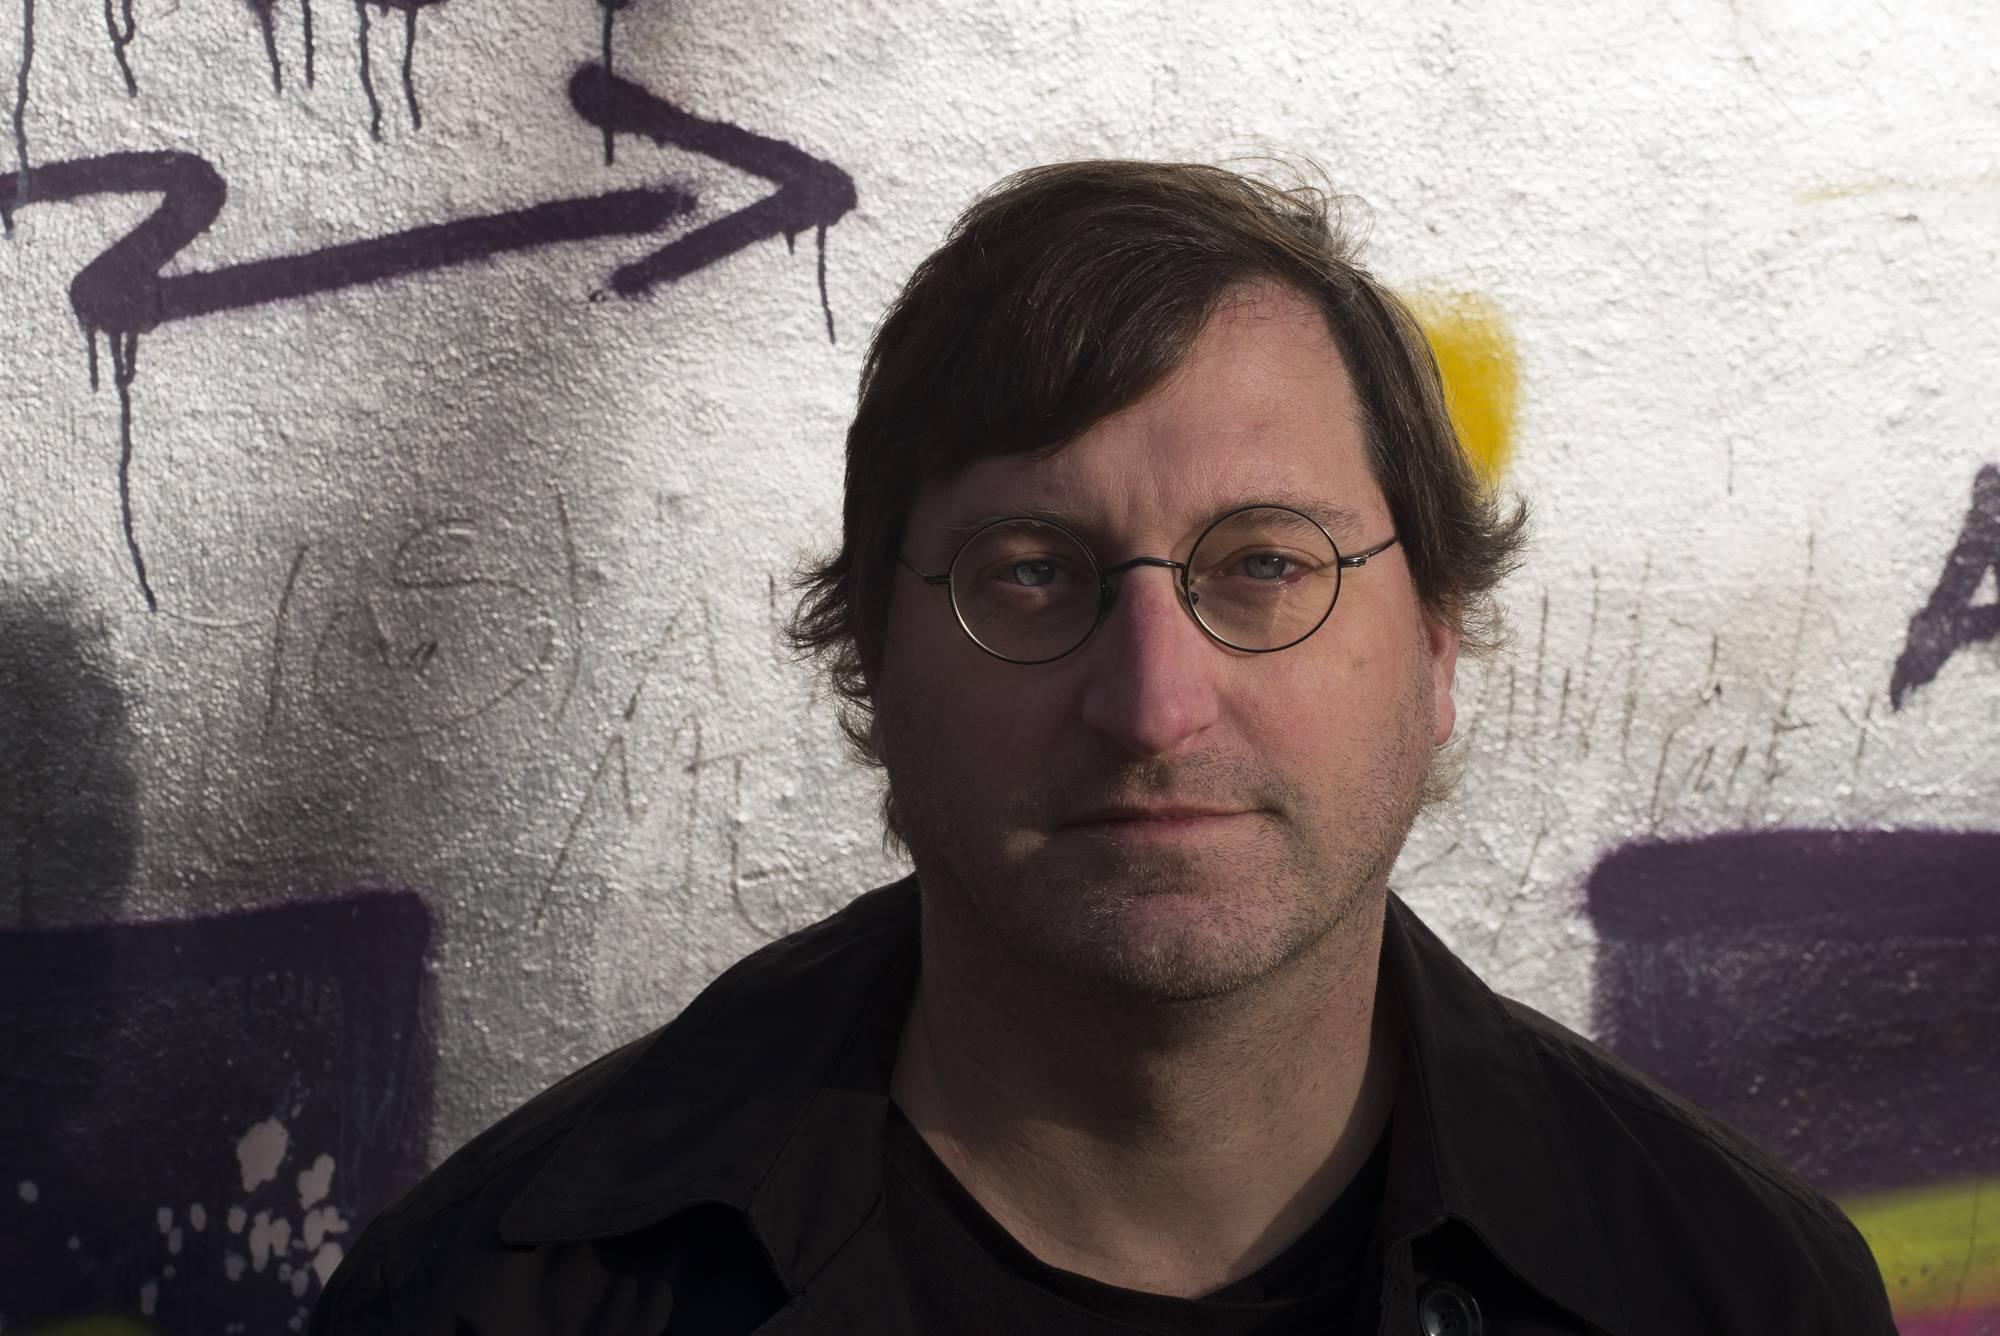 Gilles Aubry, Berlin, 2018 (Image: Wolfram Hahn)